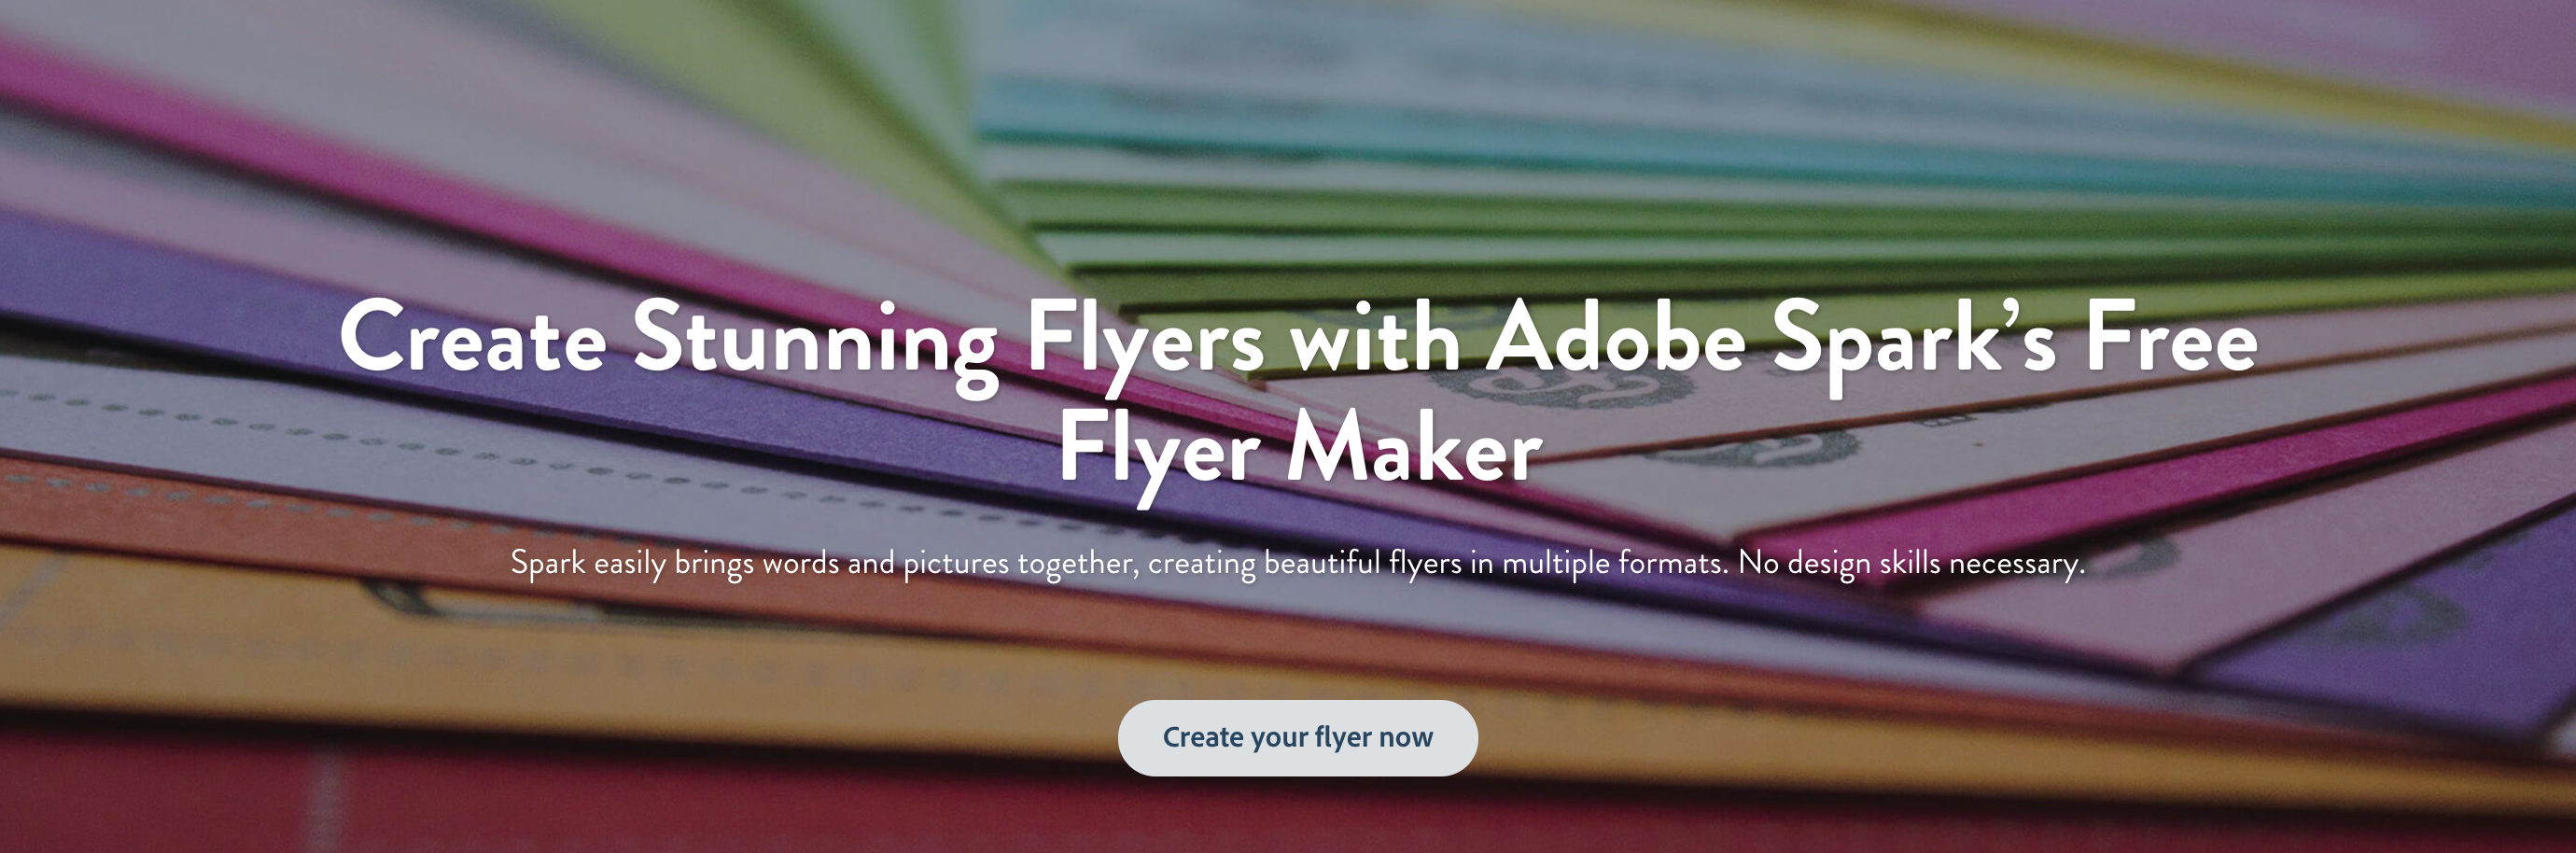 Flyer Maker: Create Beautiful Flyers For Free | Adobe Spark - Free Printable Flyer Maker Online